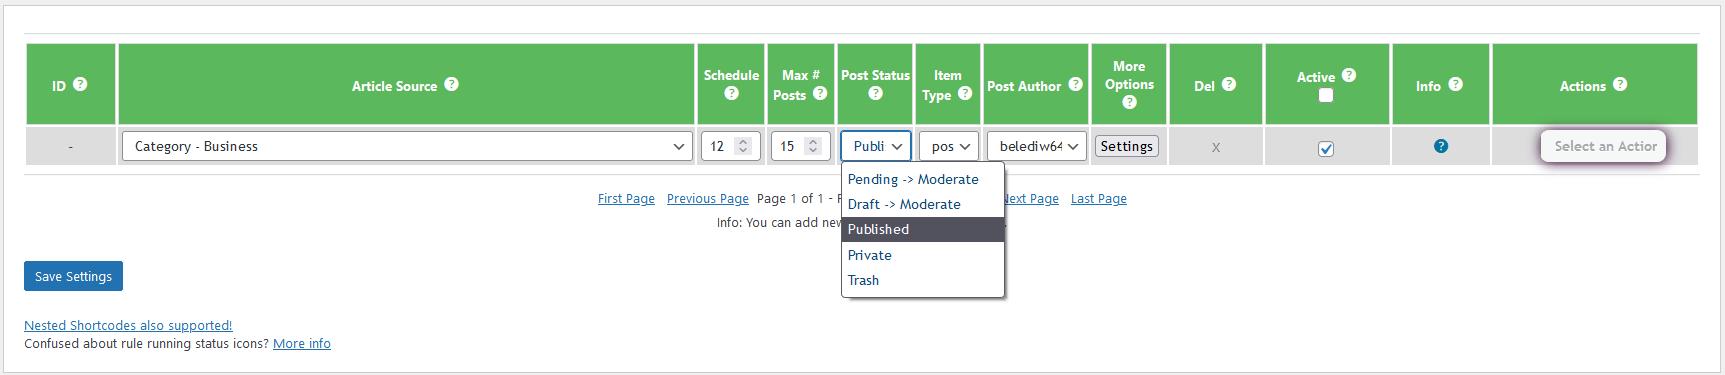 Add custom news posts - 6